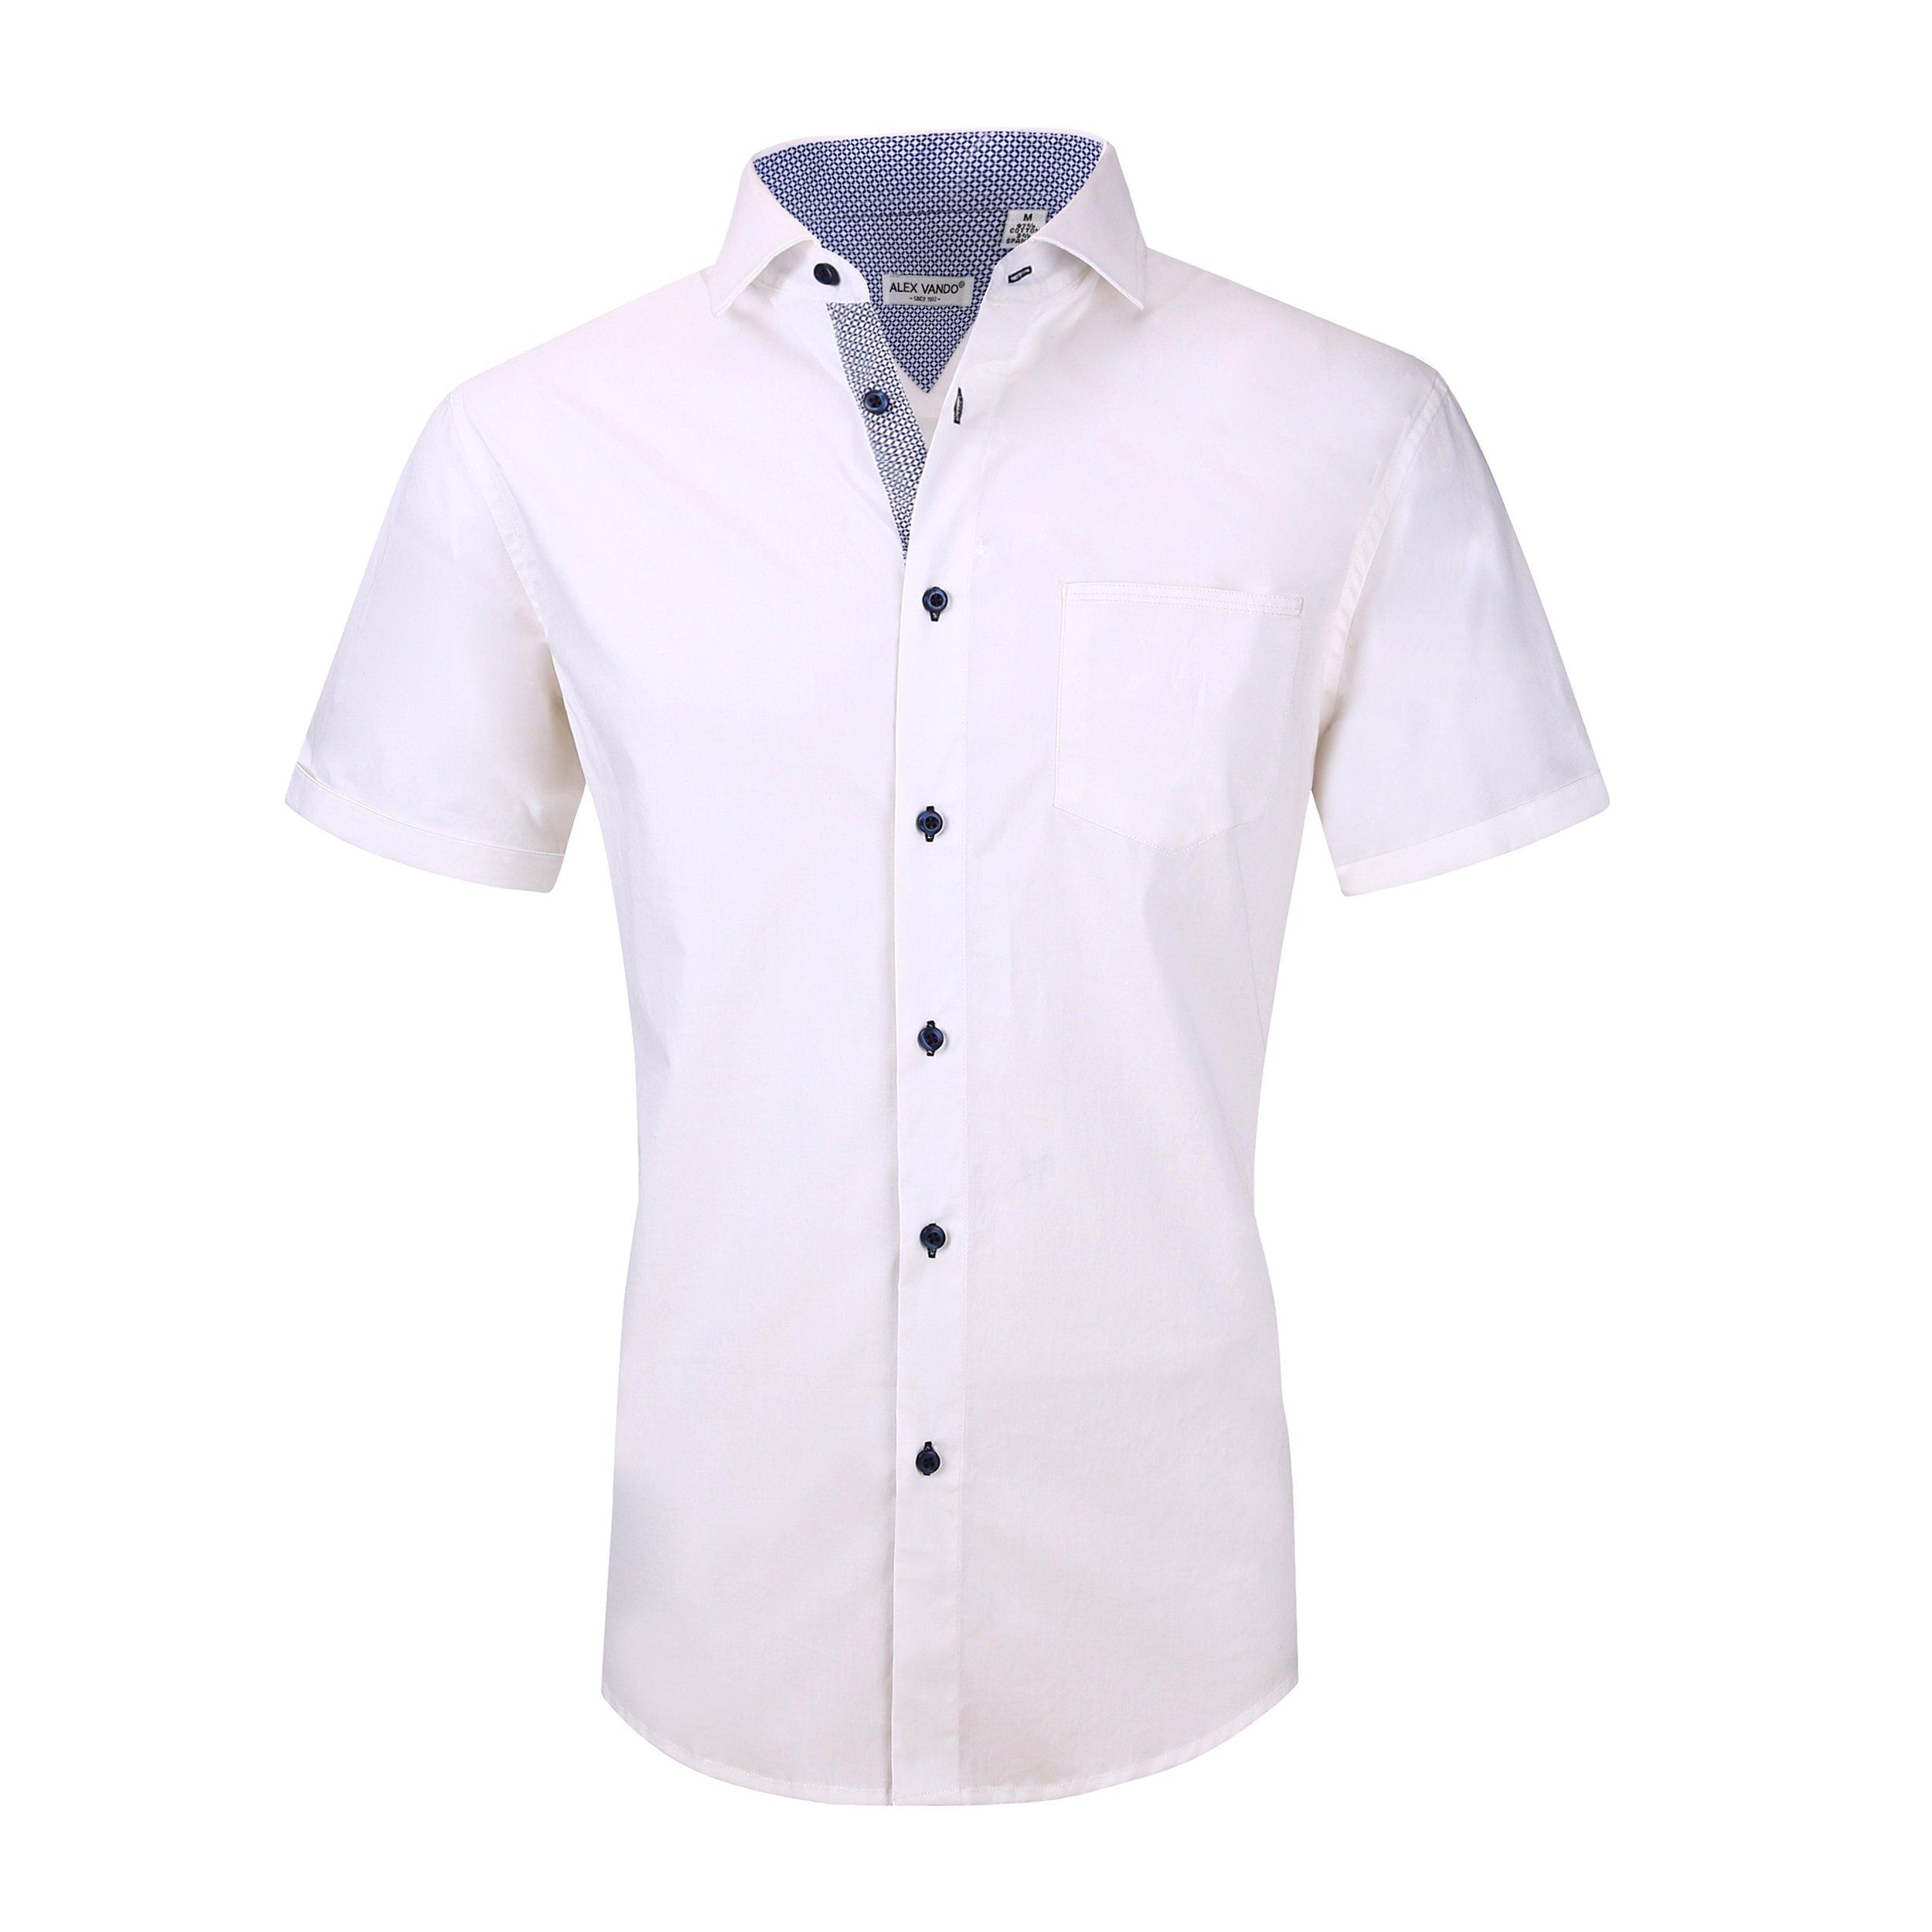 Alex Vando Mens Dress Shirts Cotton Poplin Spandex Short Sleeve Regular Fit Casual Spread Collar Shirt(White,Large)